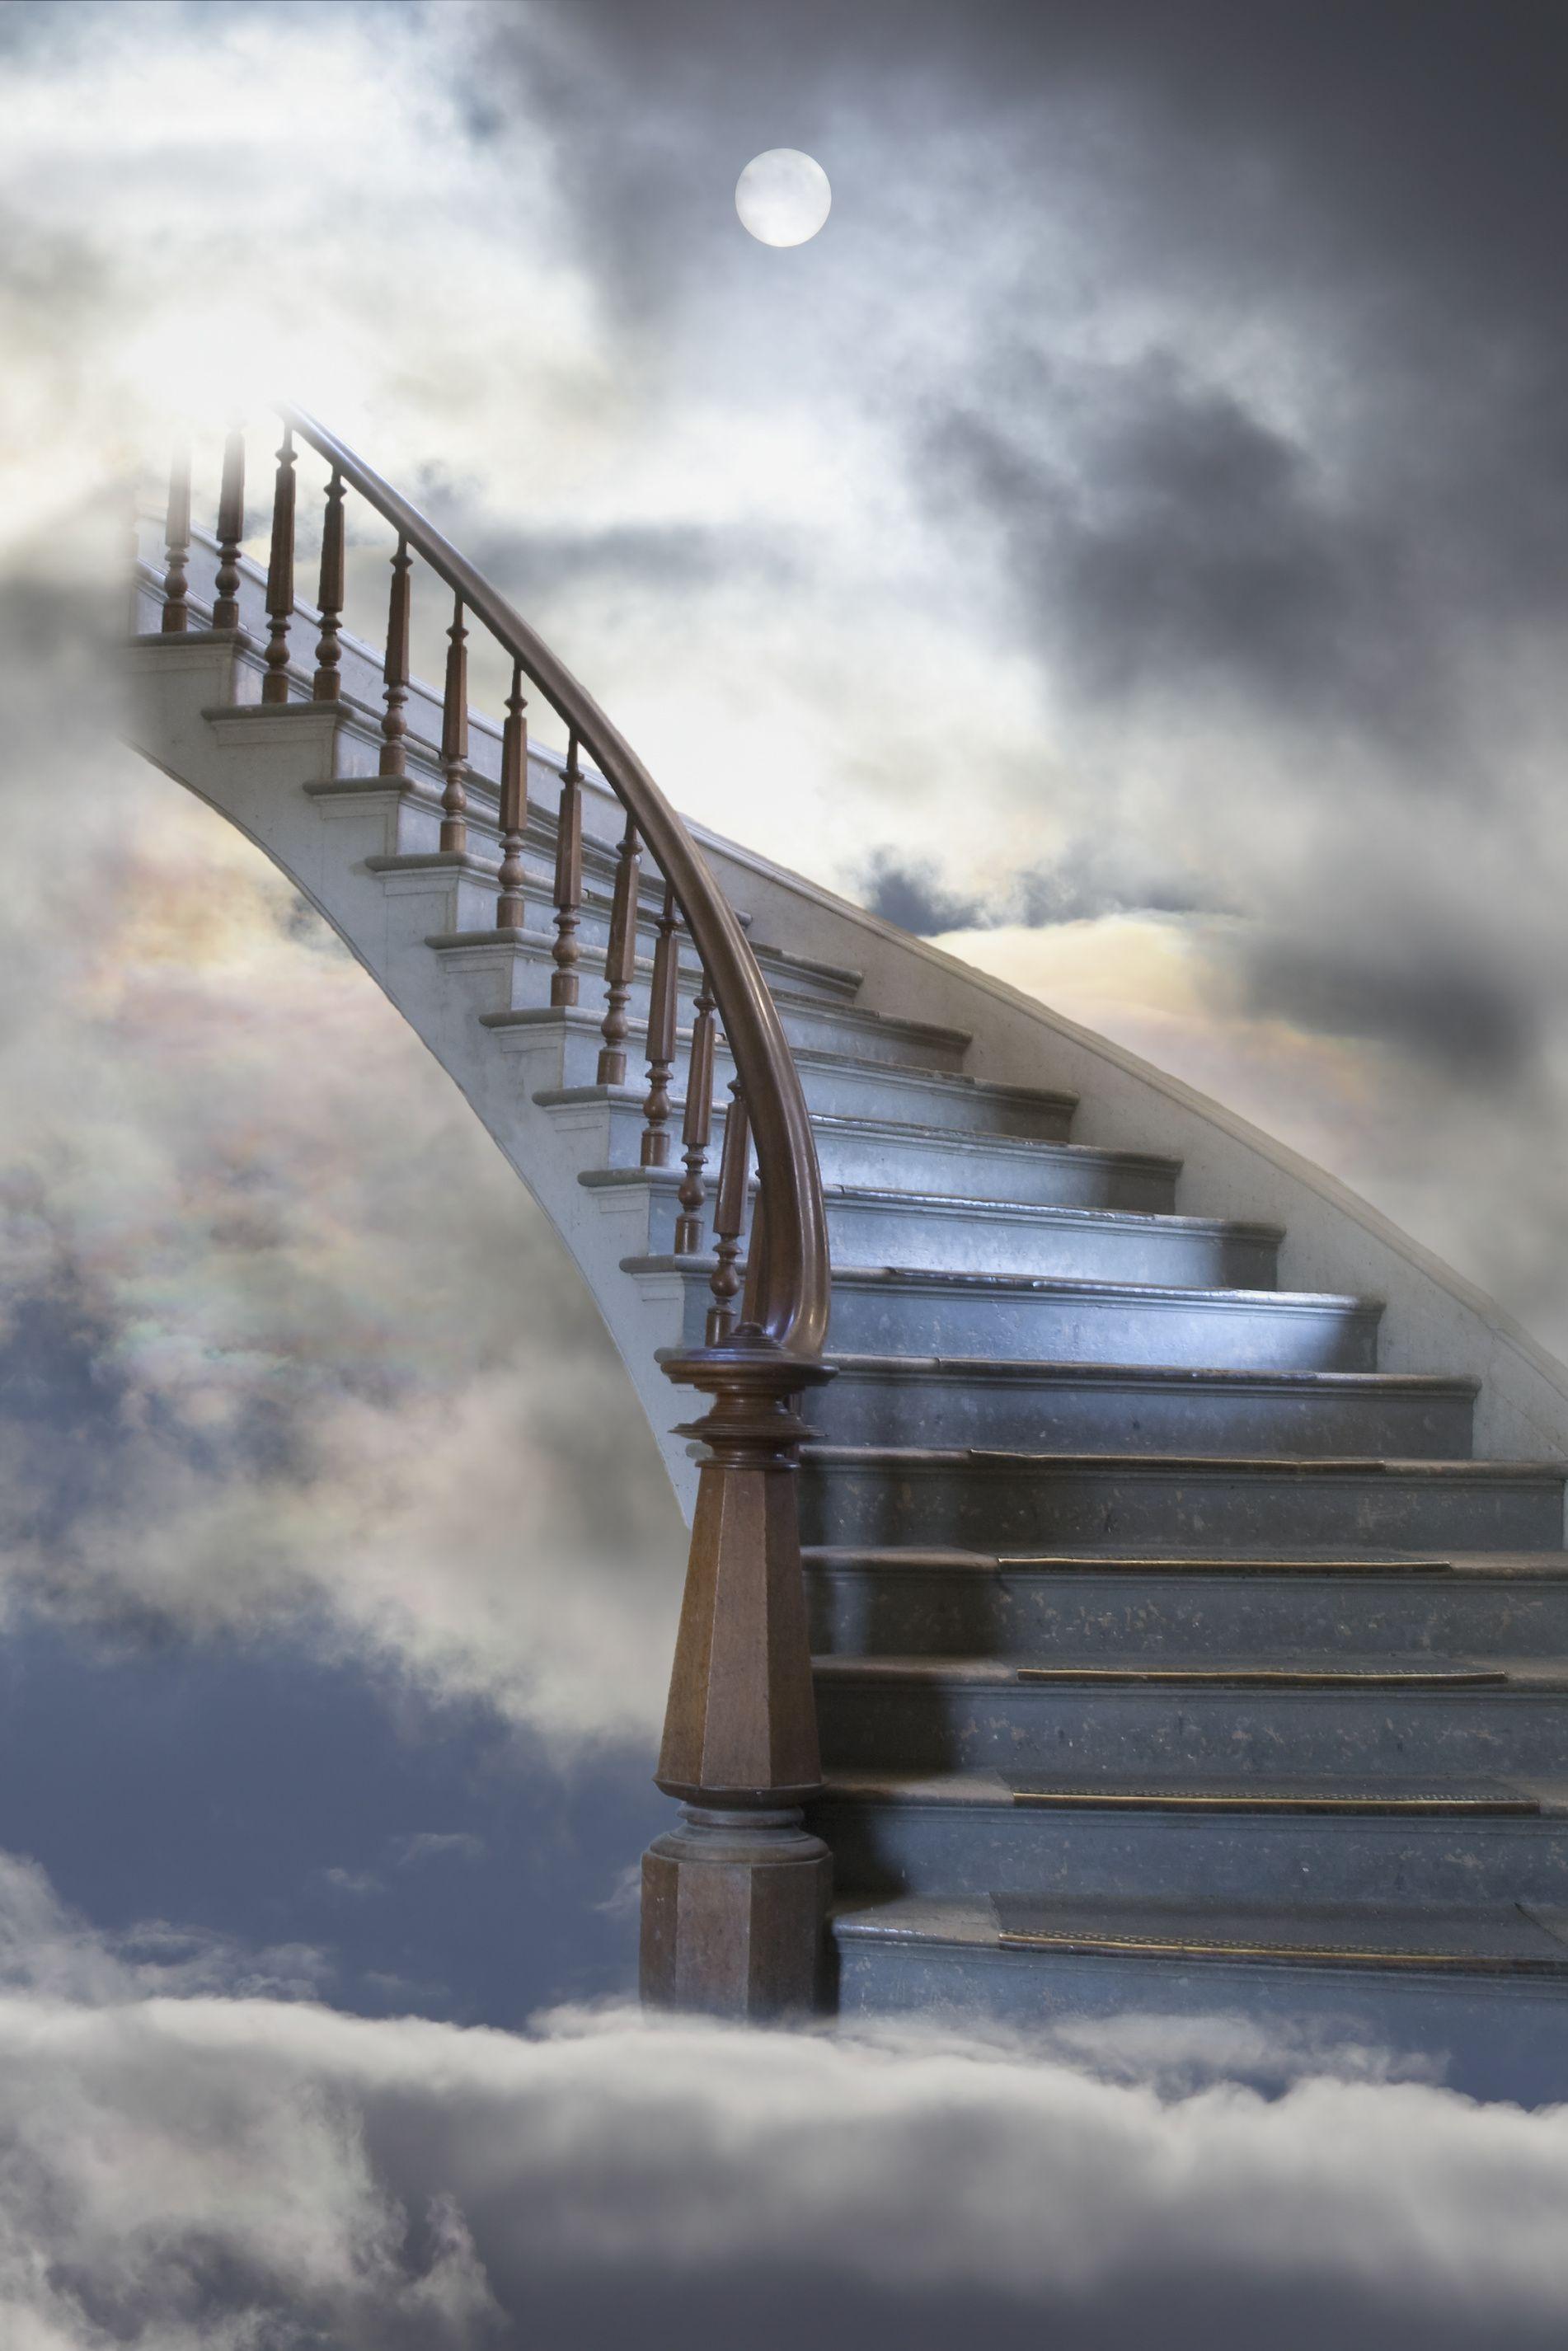 Stairway To Heaven Wallpapers - Wallpaper Cave